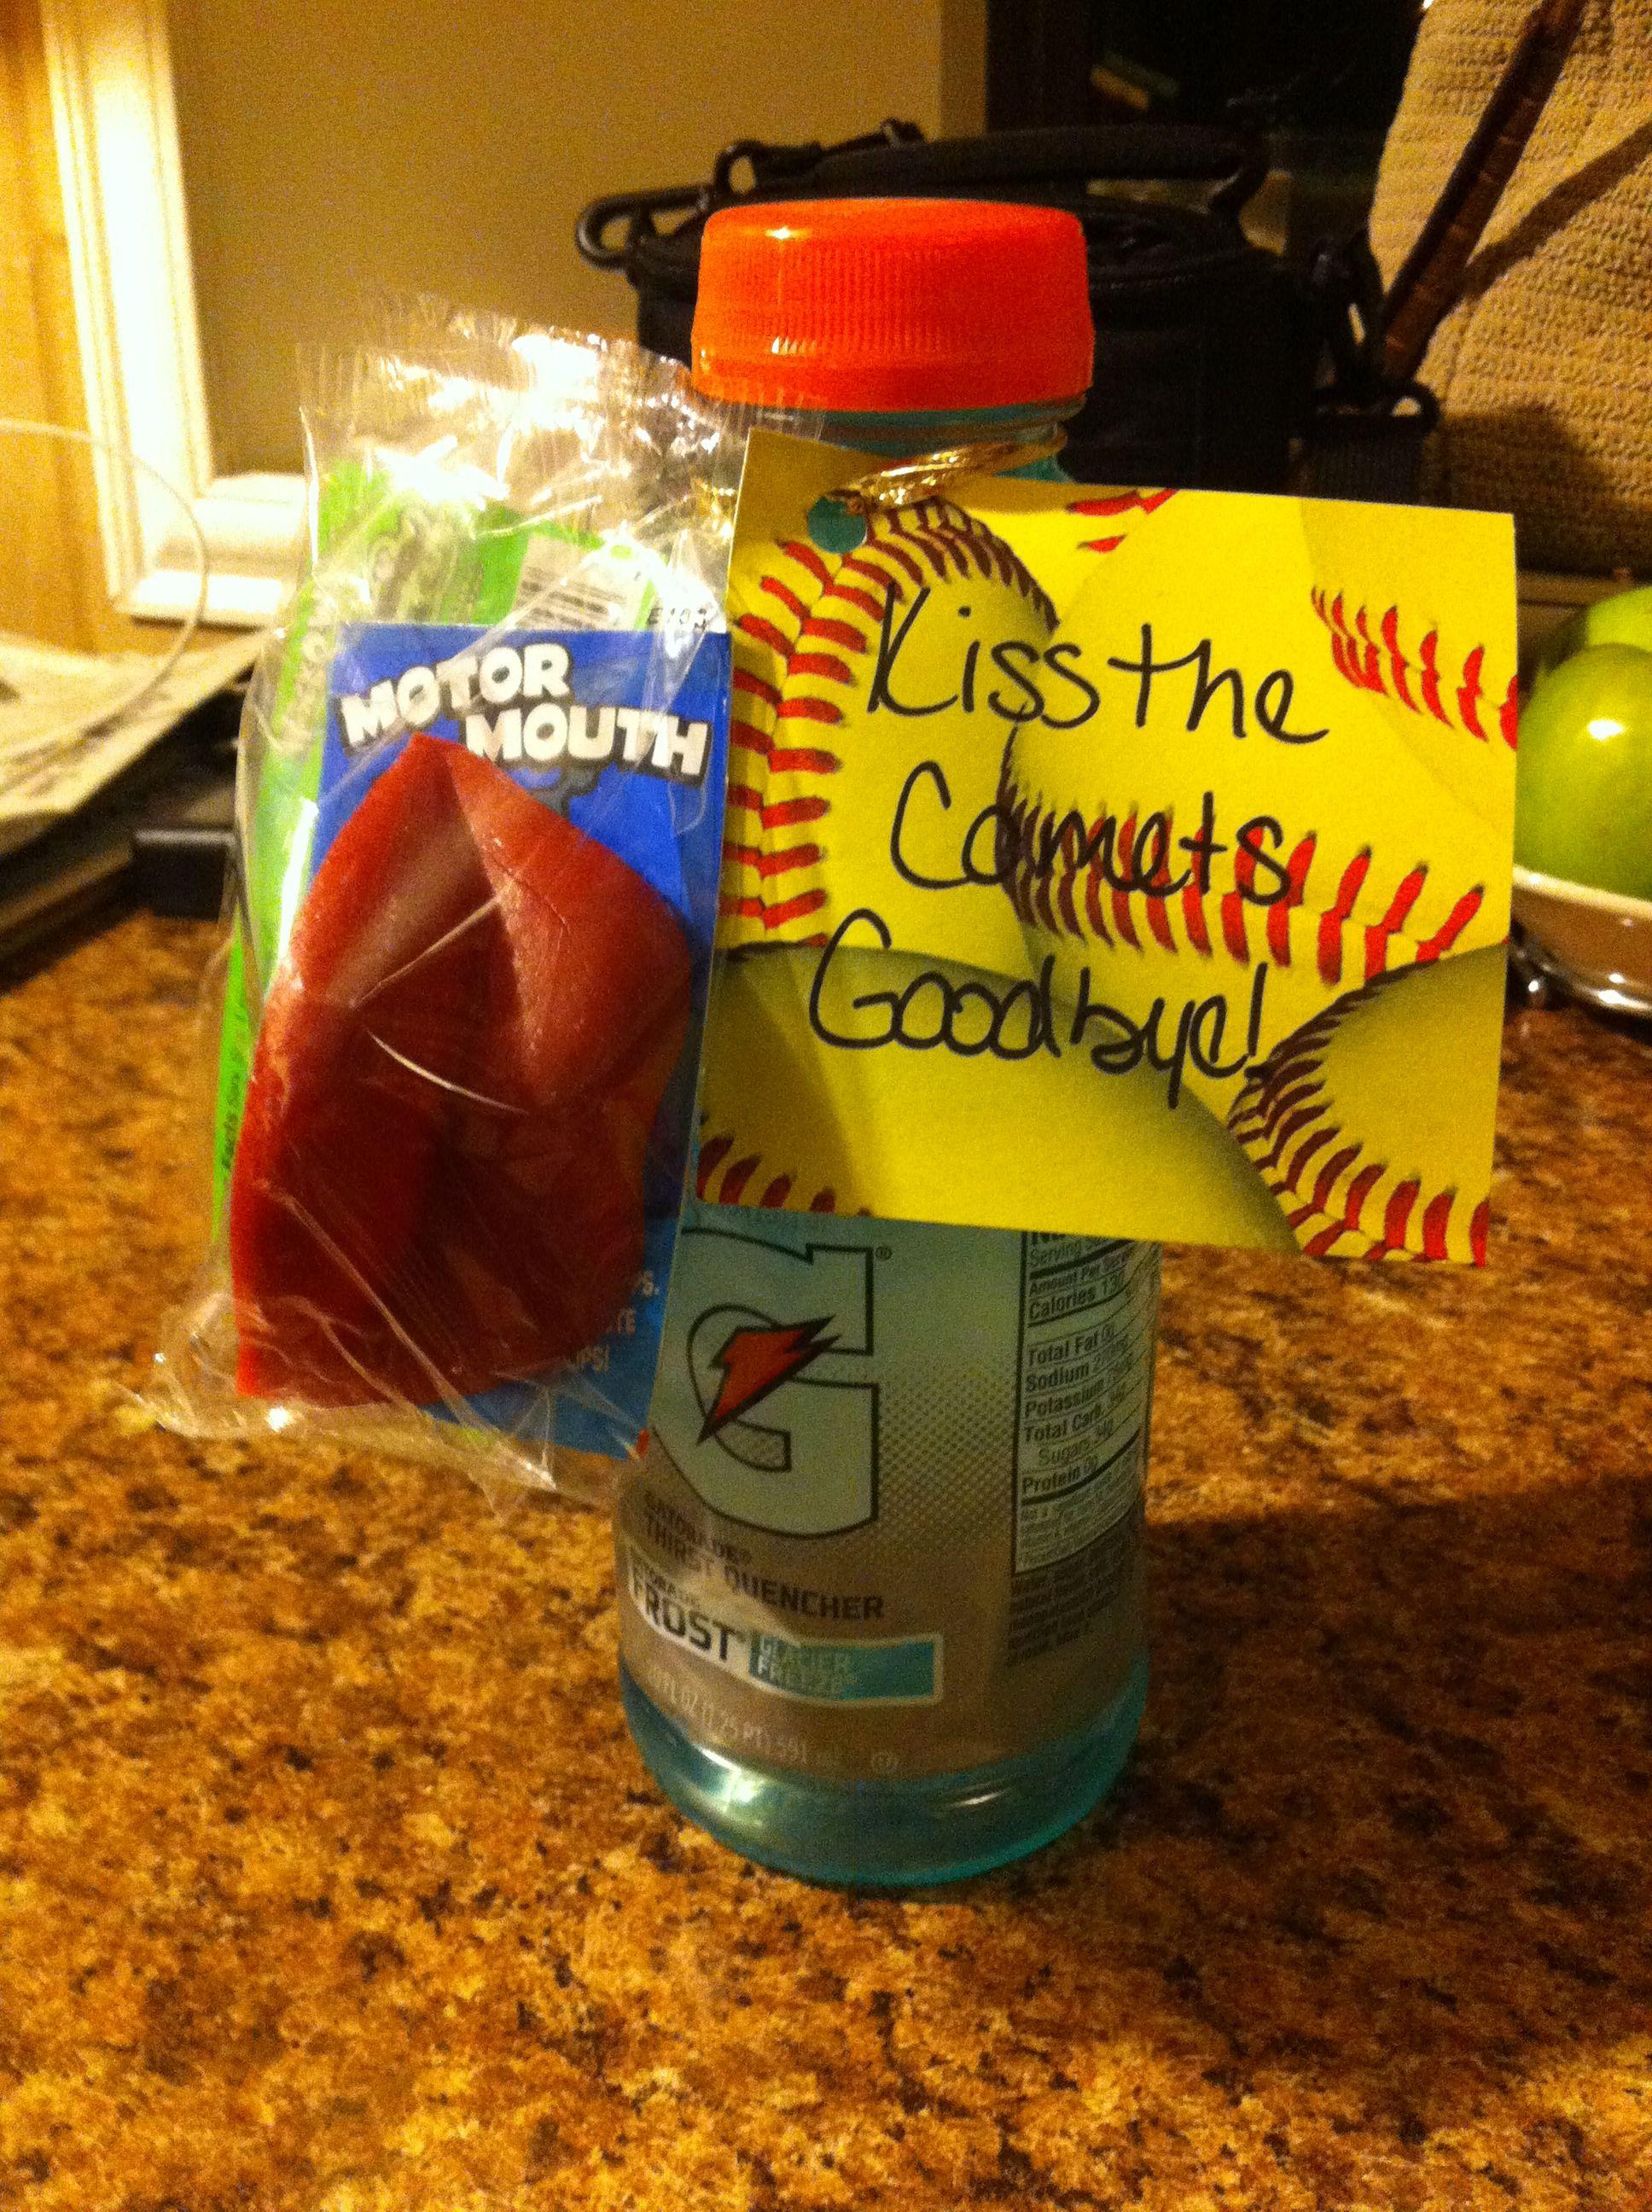 Kiss Comets Goodbye Wax Lips & Gatorade Softball